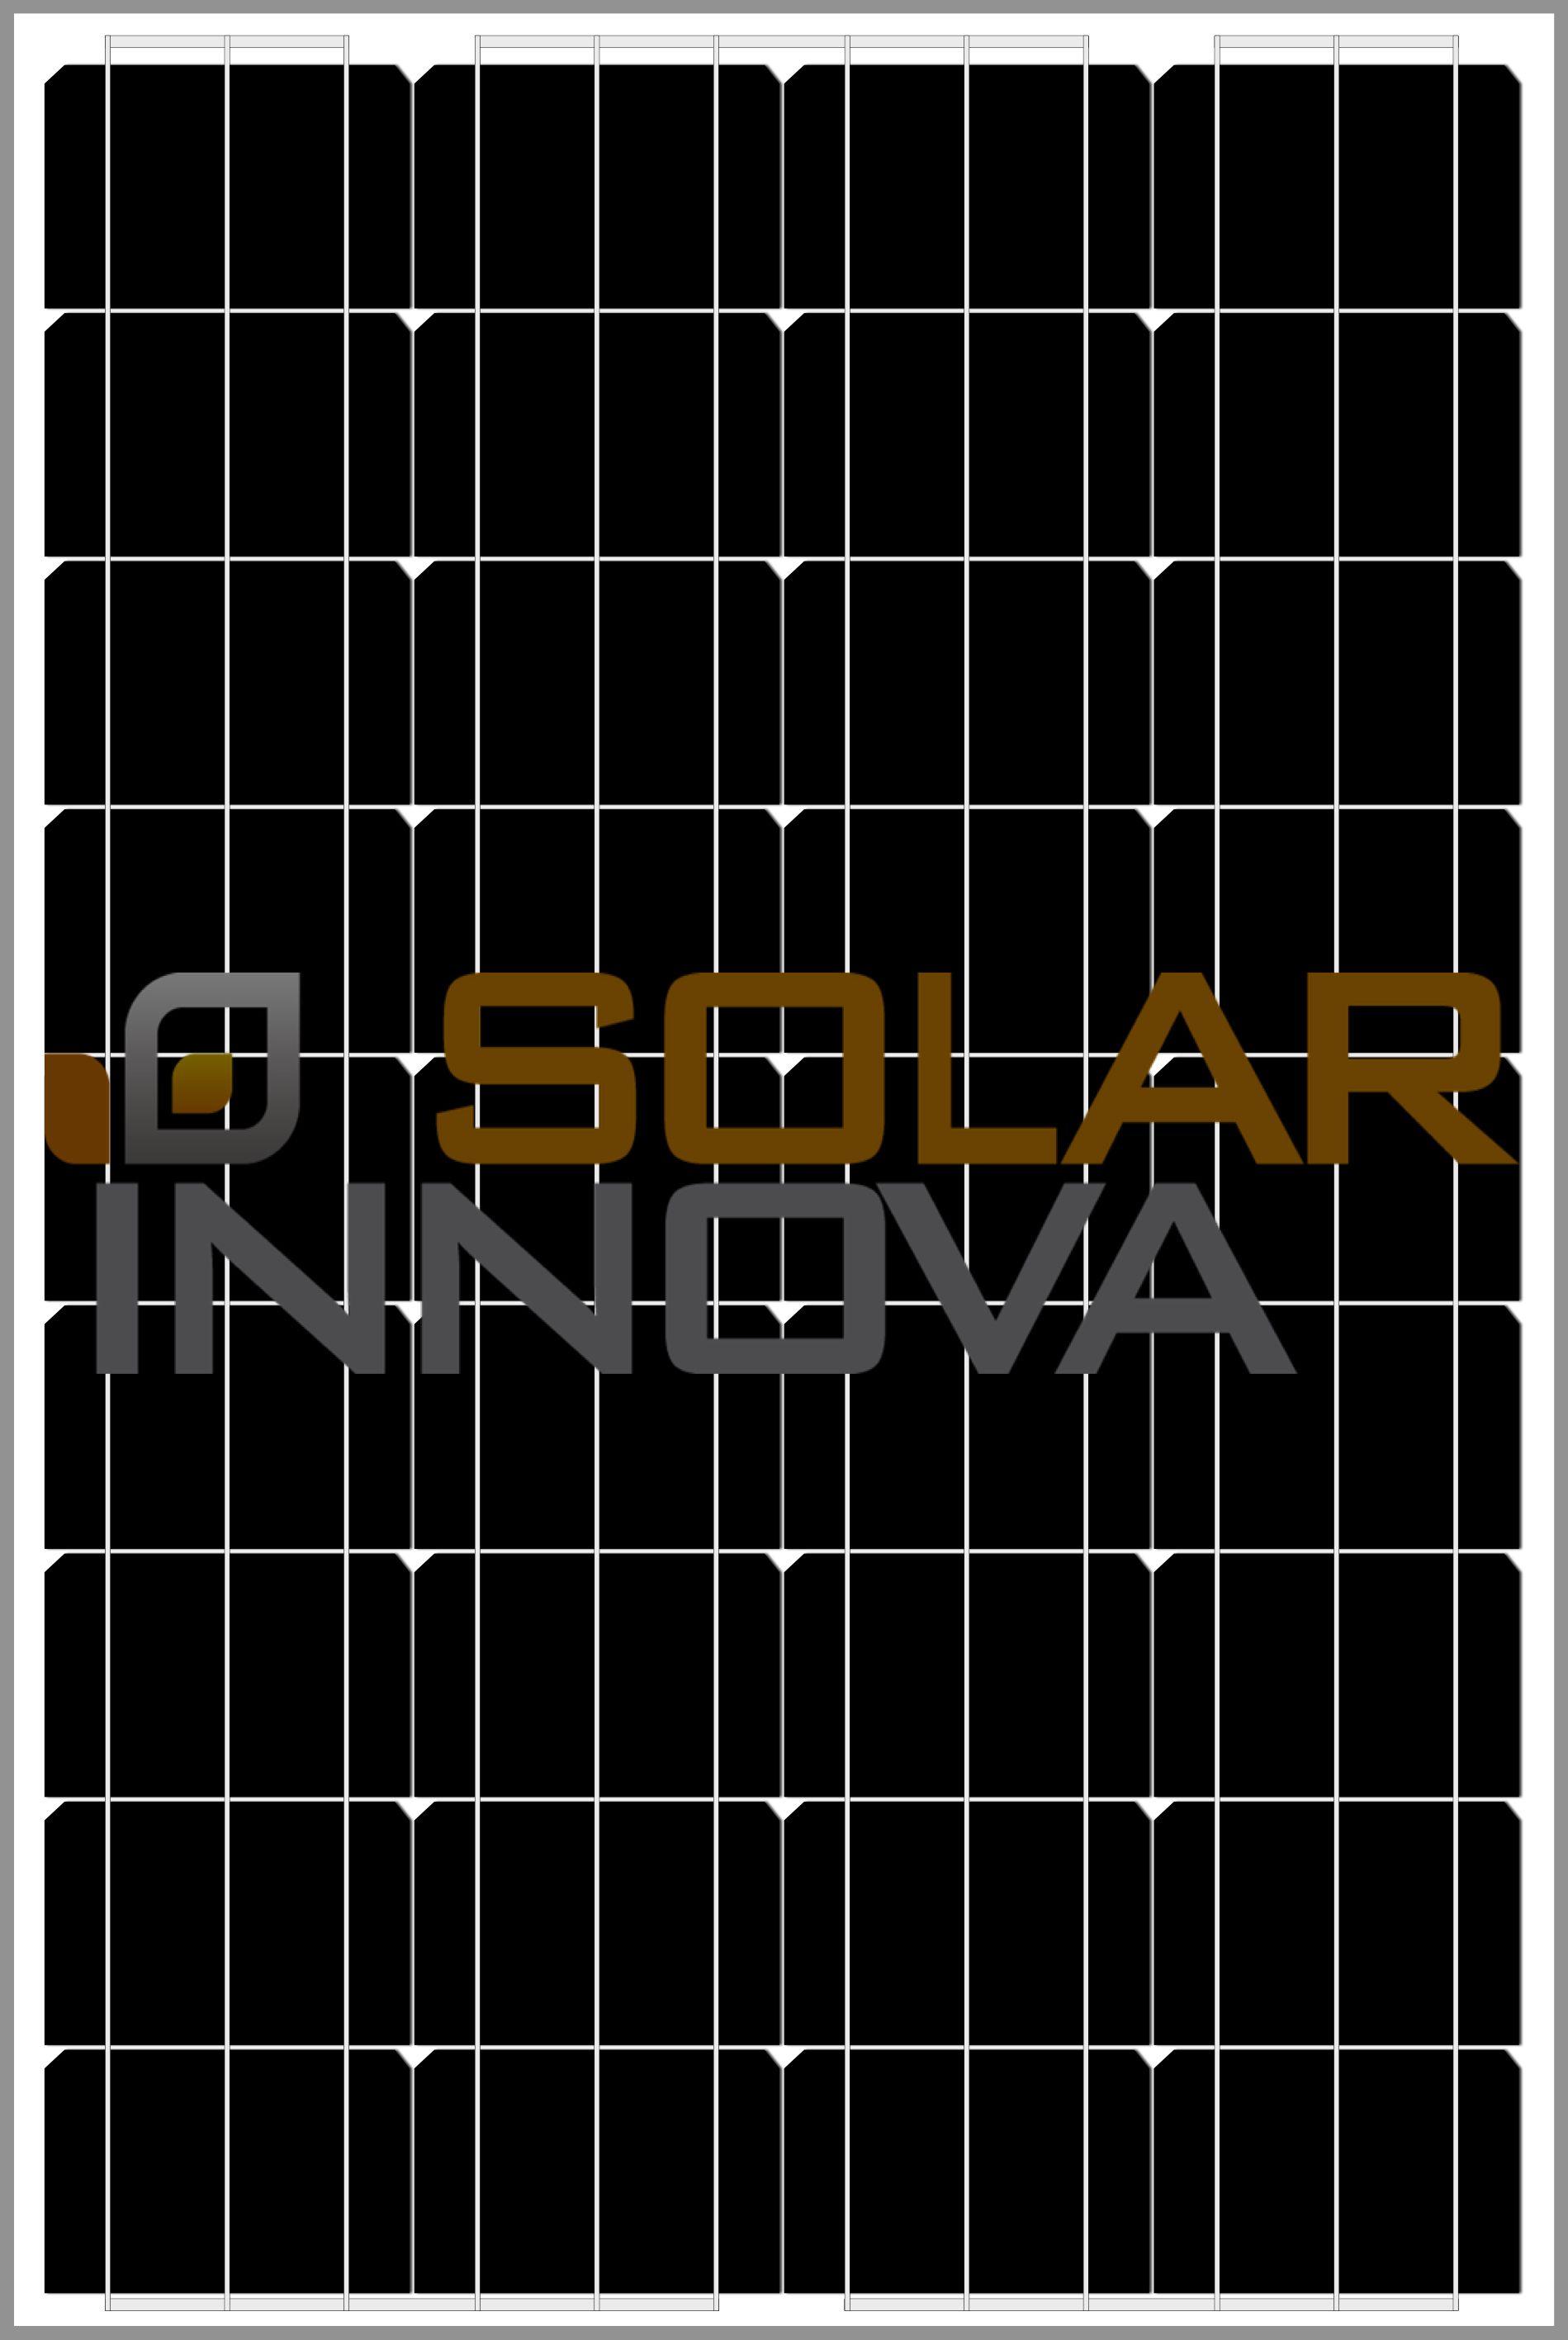 Monocrystalline Solar Panel 95 Wp #solarinnova #solar #energy #solarenergy #renewableenergy #photovoltaic #solarpower #solarpv #pvpanel #pvpanels #solarpanels #solarmodules #pvmodule #pvmodules #monocrystalline #electricity #cleanenergy #greenenergy #energia #energiasolar #energiarenovable #fotovoltaica #panelsolar #panelessolares #panelesfotovoltaicos #modulosfotovoltaicos #monocristalinos #electricidad